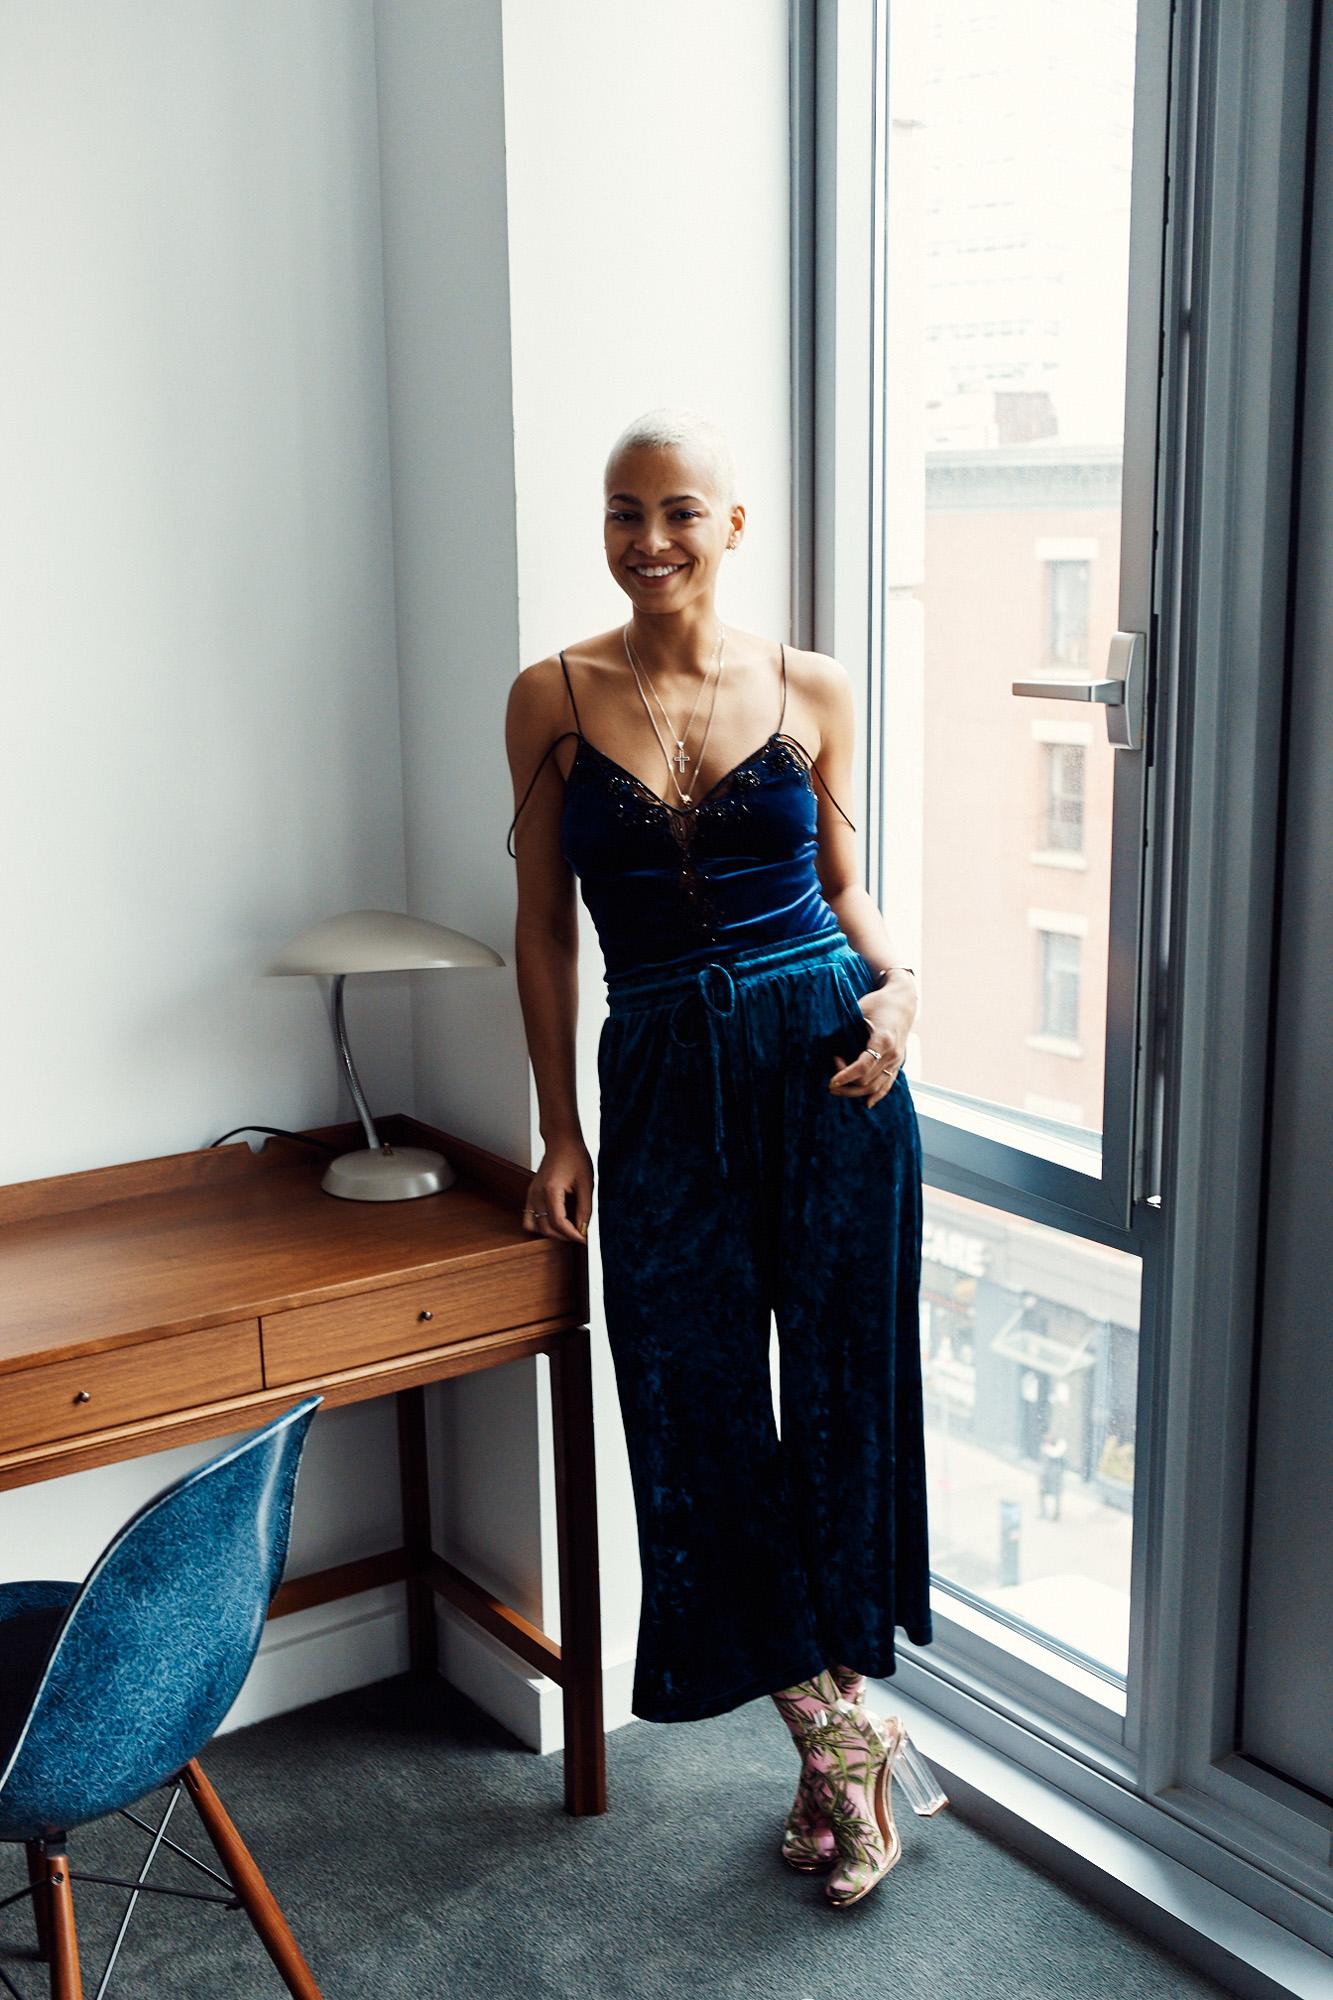 Model Kota Eberhardt Talks Racism In The Industry Beauty